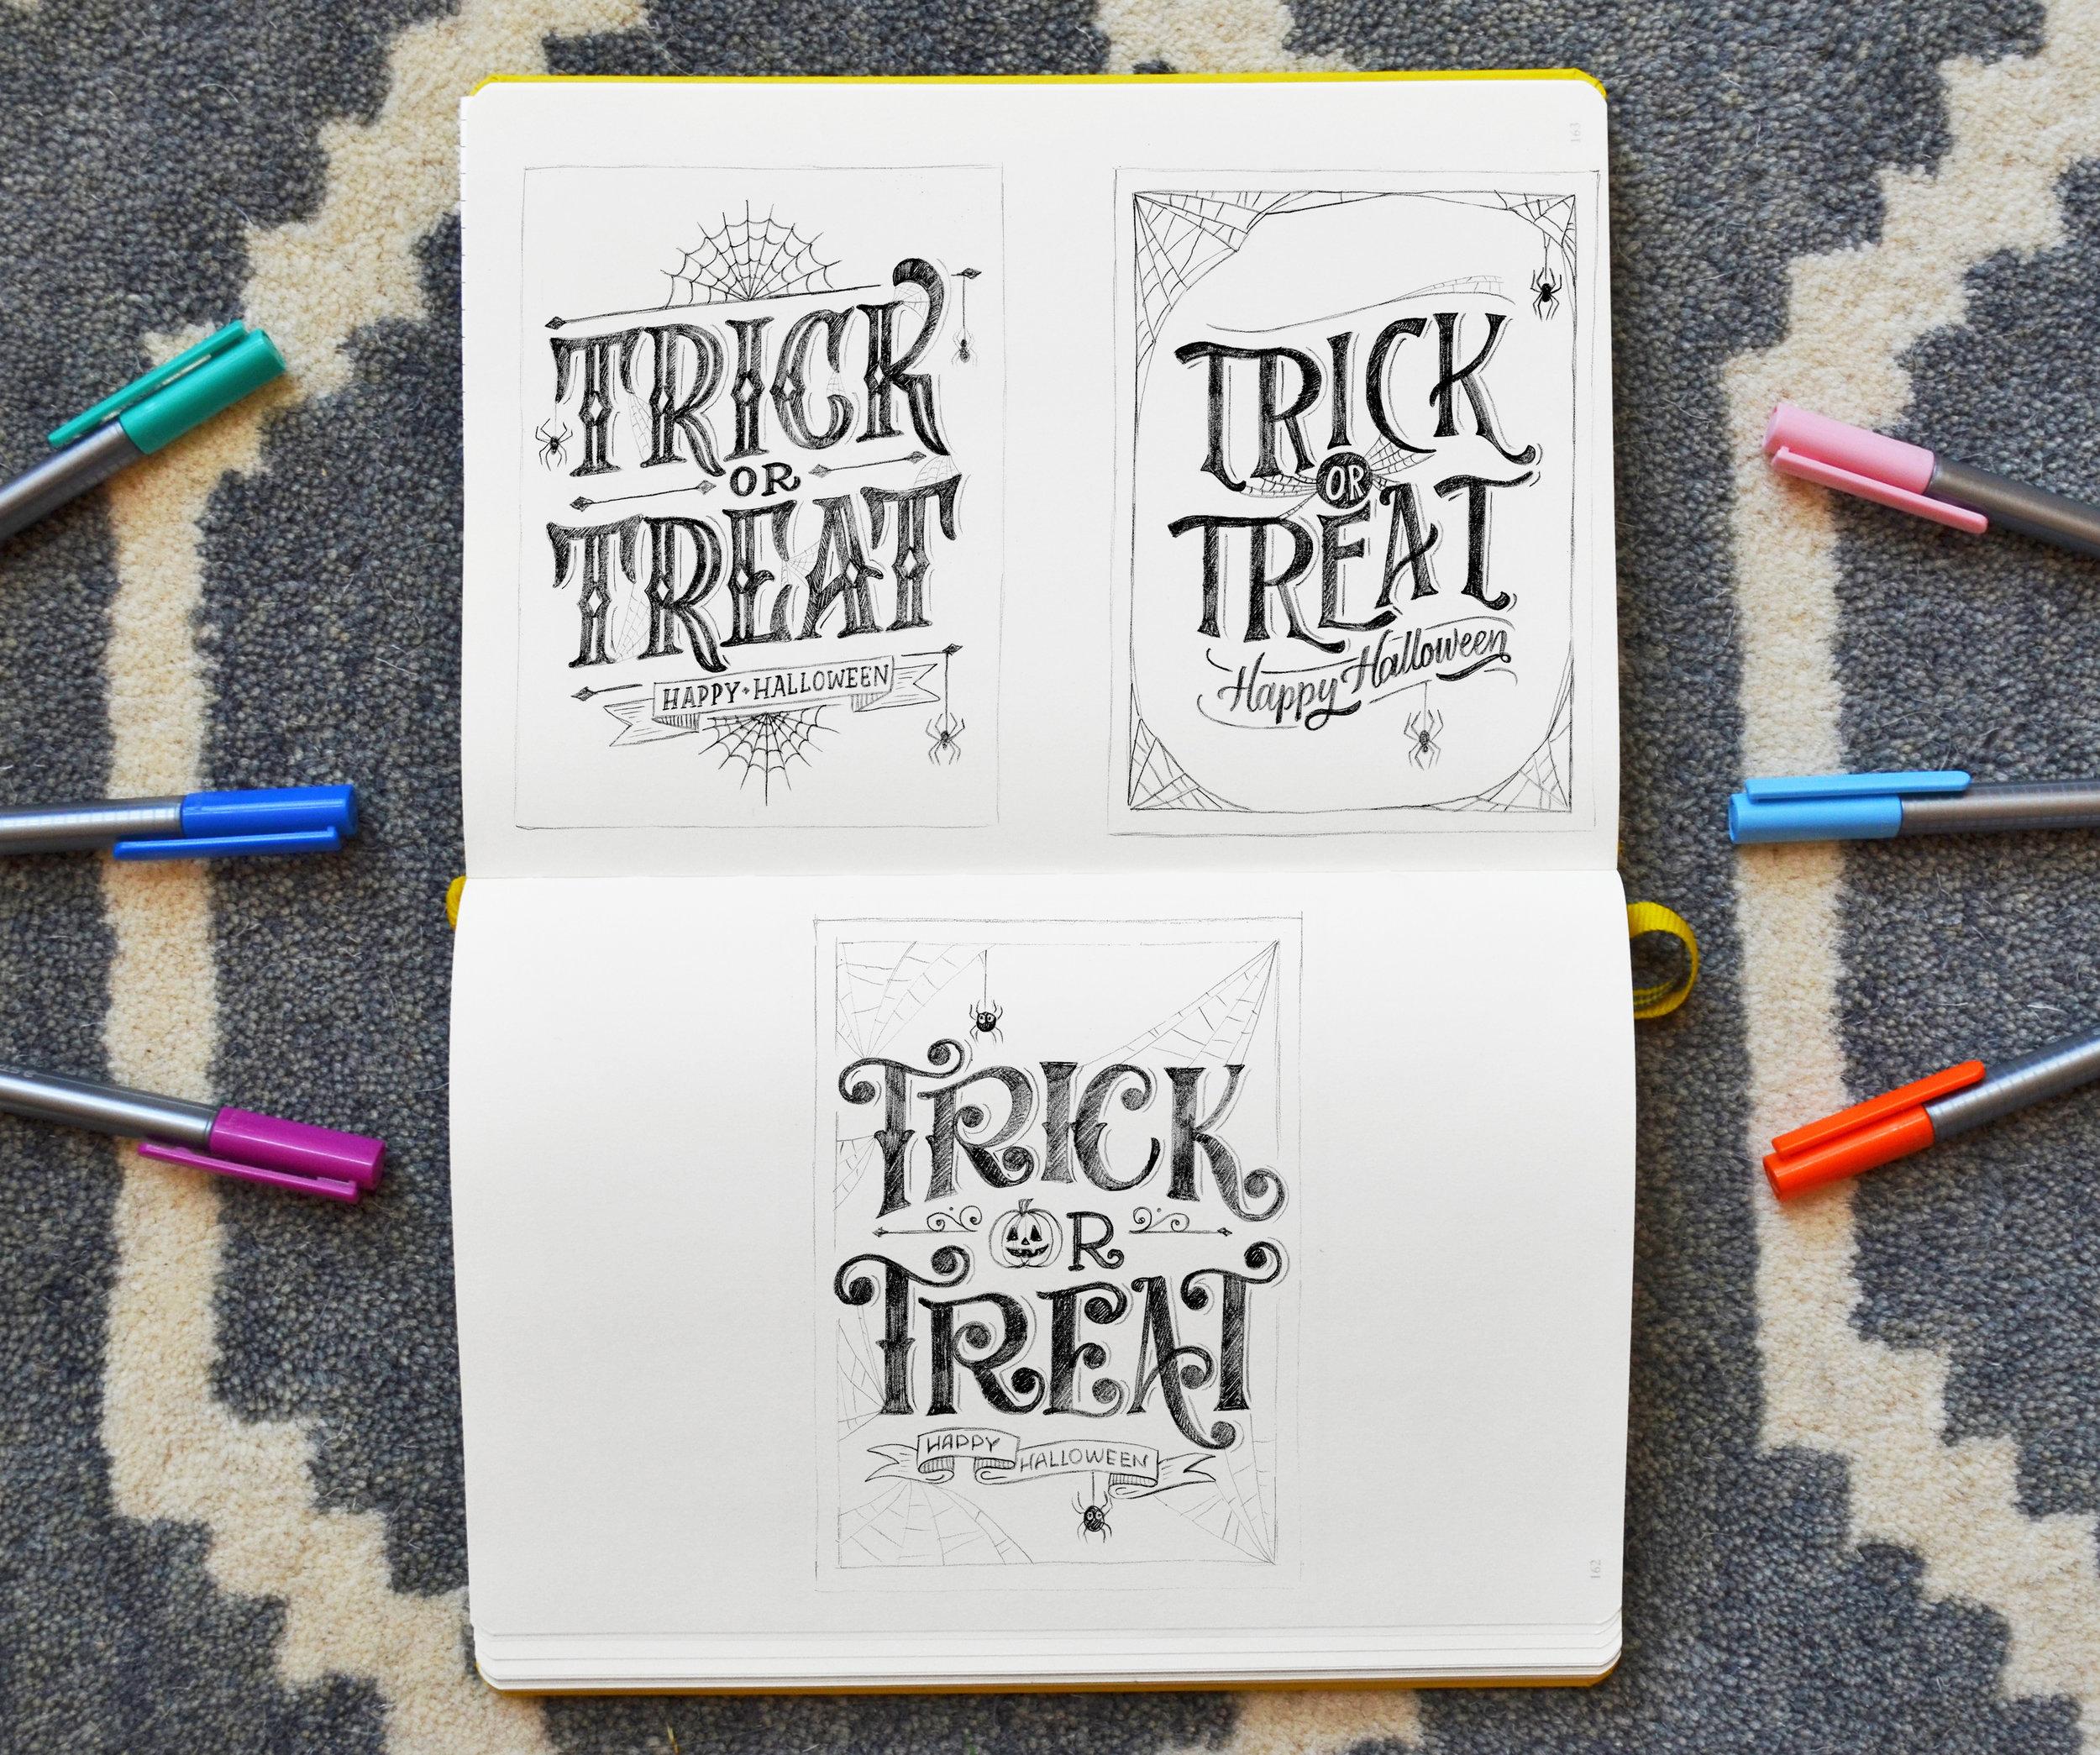 TrickOrTreat_Sketches .jpg